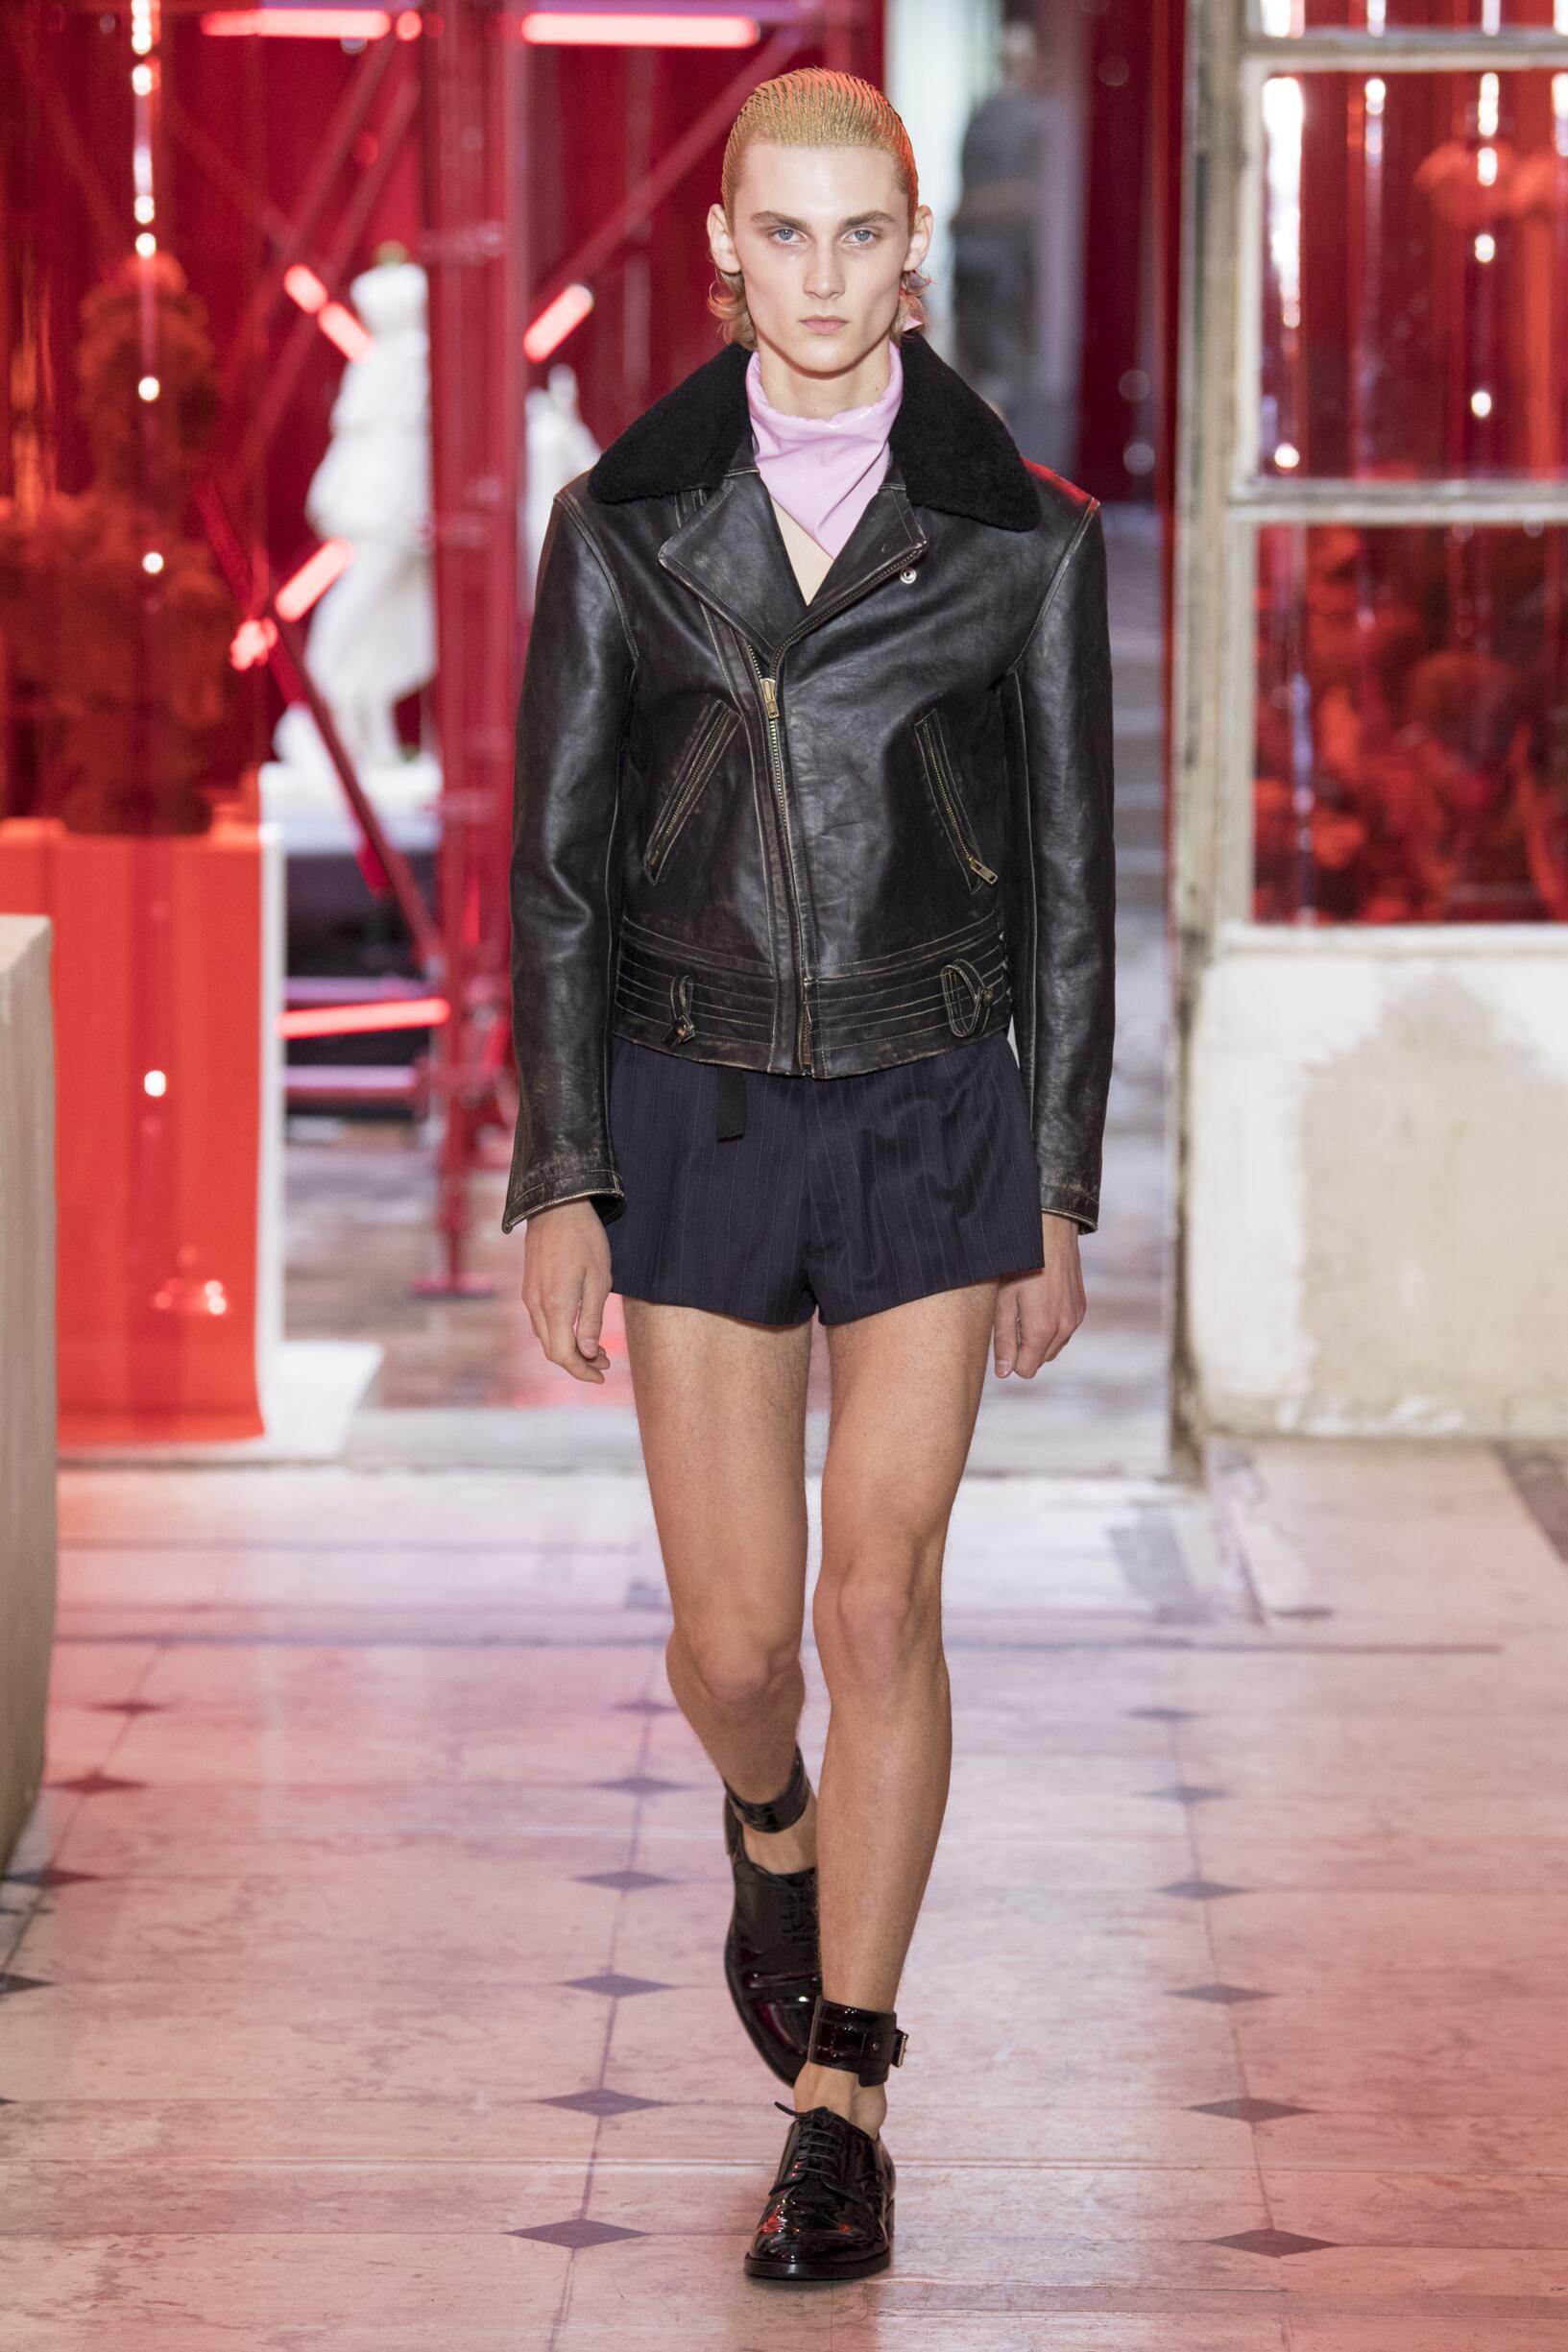 Summer 2019 Fashion Trends Maison Margiela